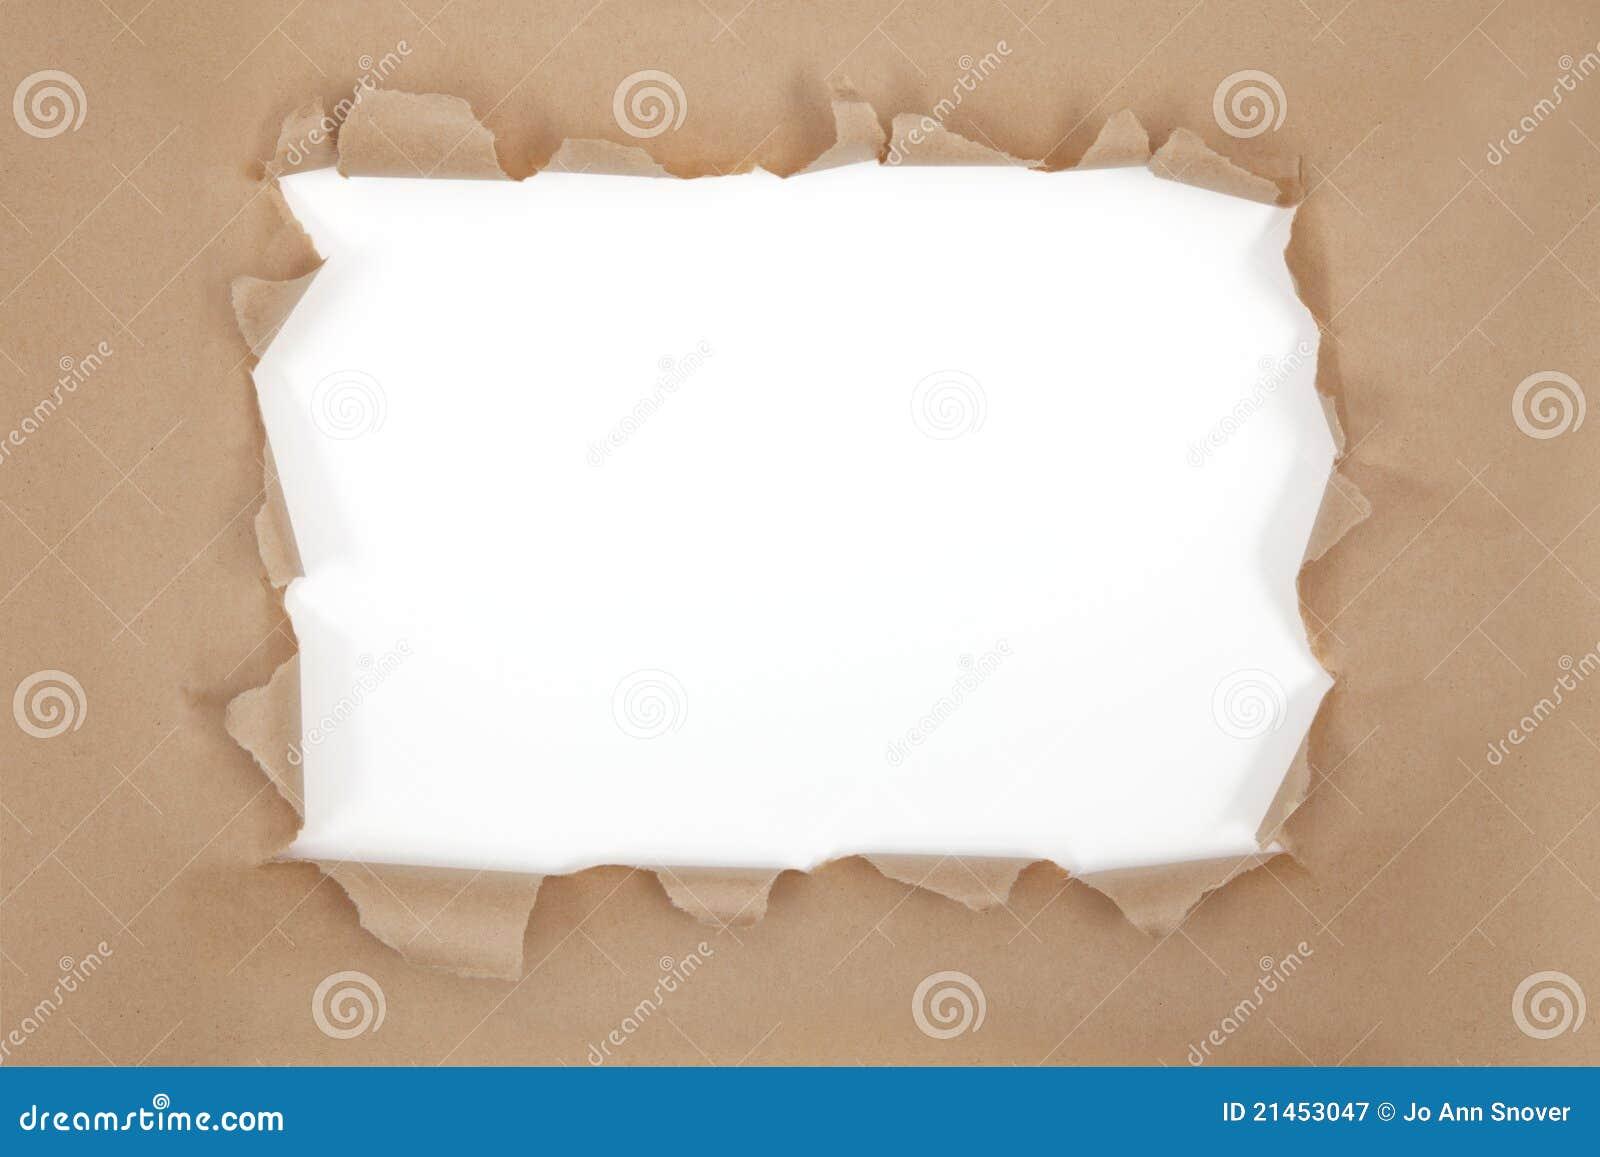 Torn brown paper frame